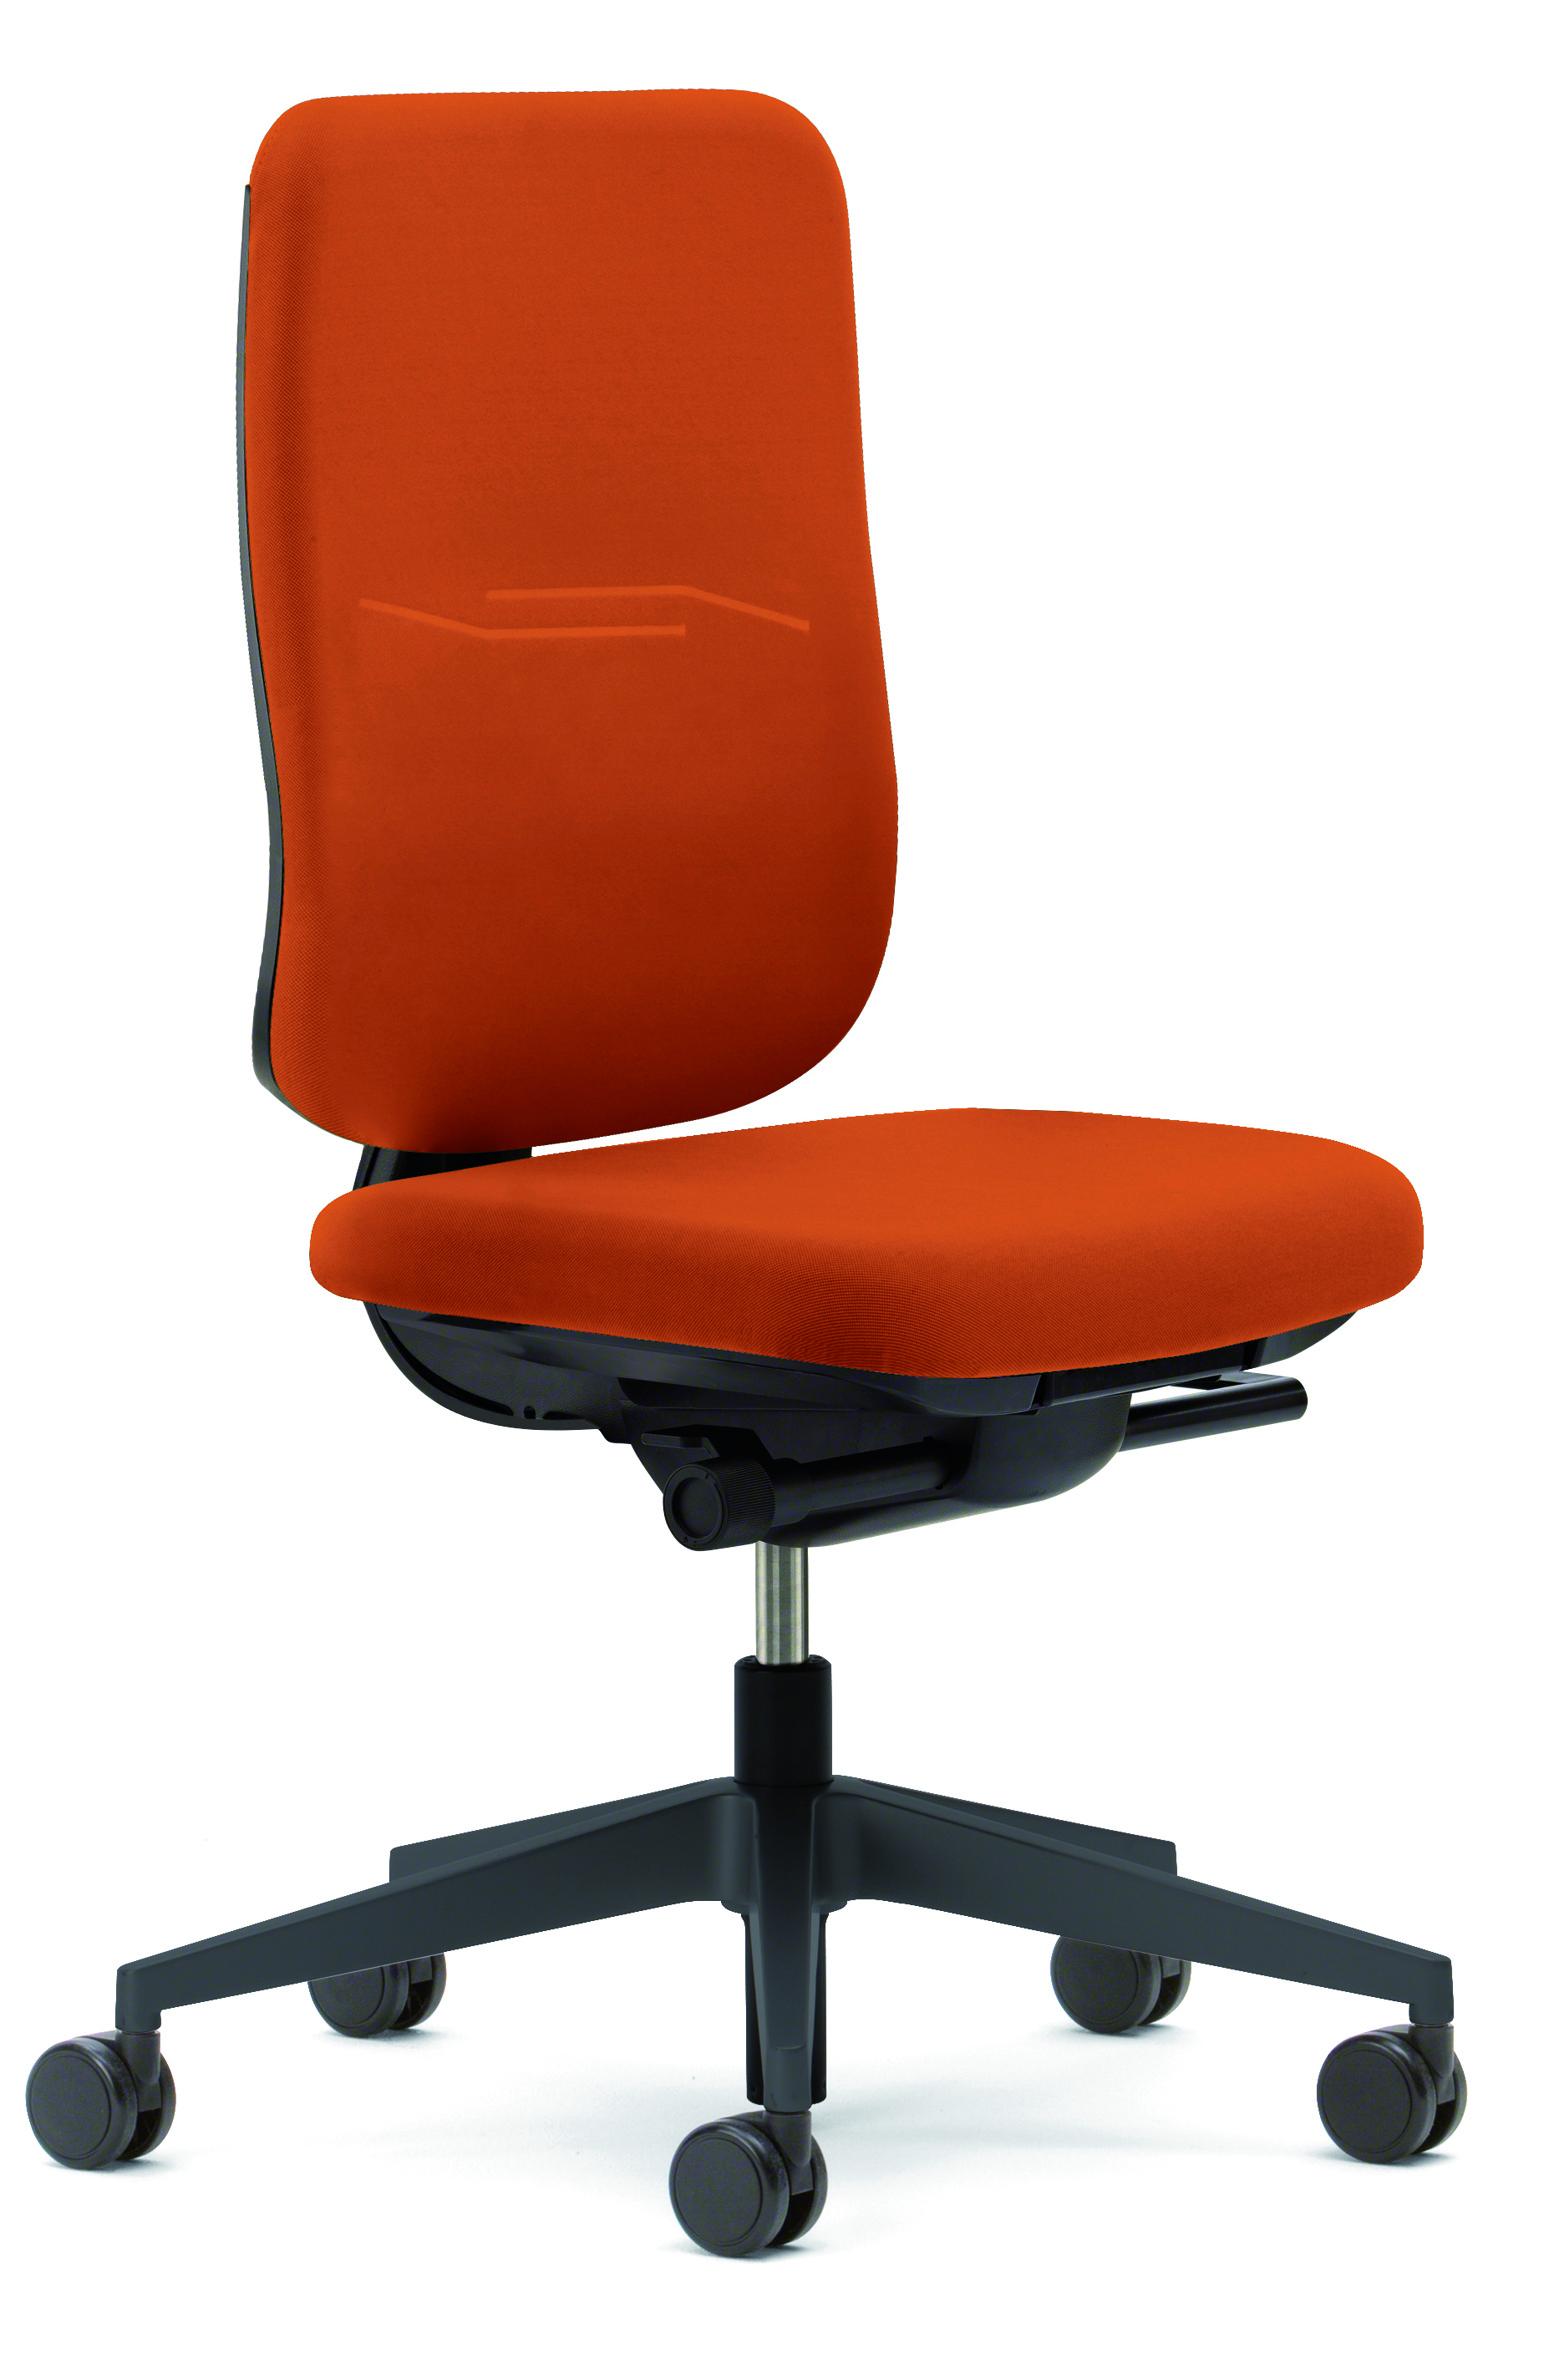 Bureau Chaise Vwr Nnyvo0w8m Chaise De Bureau iZTXukOP